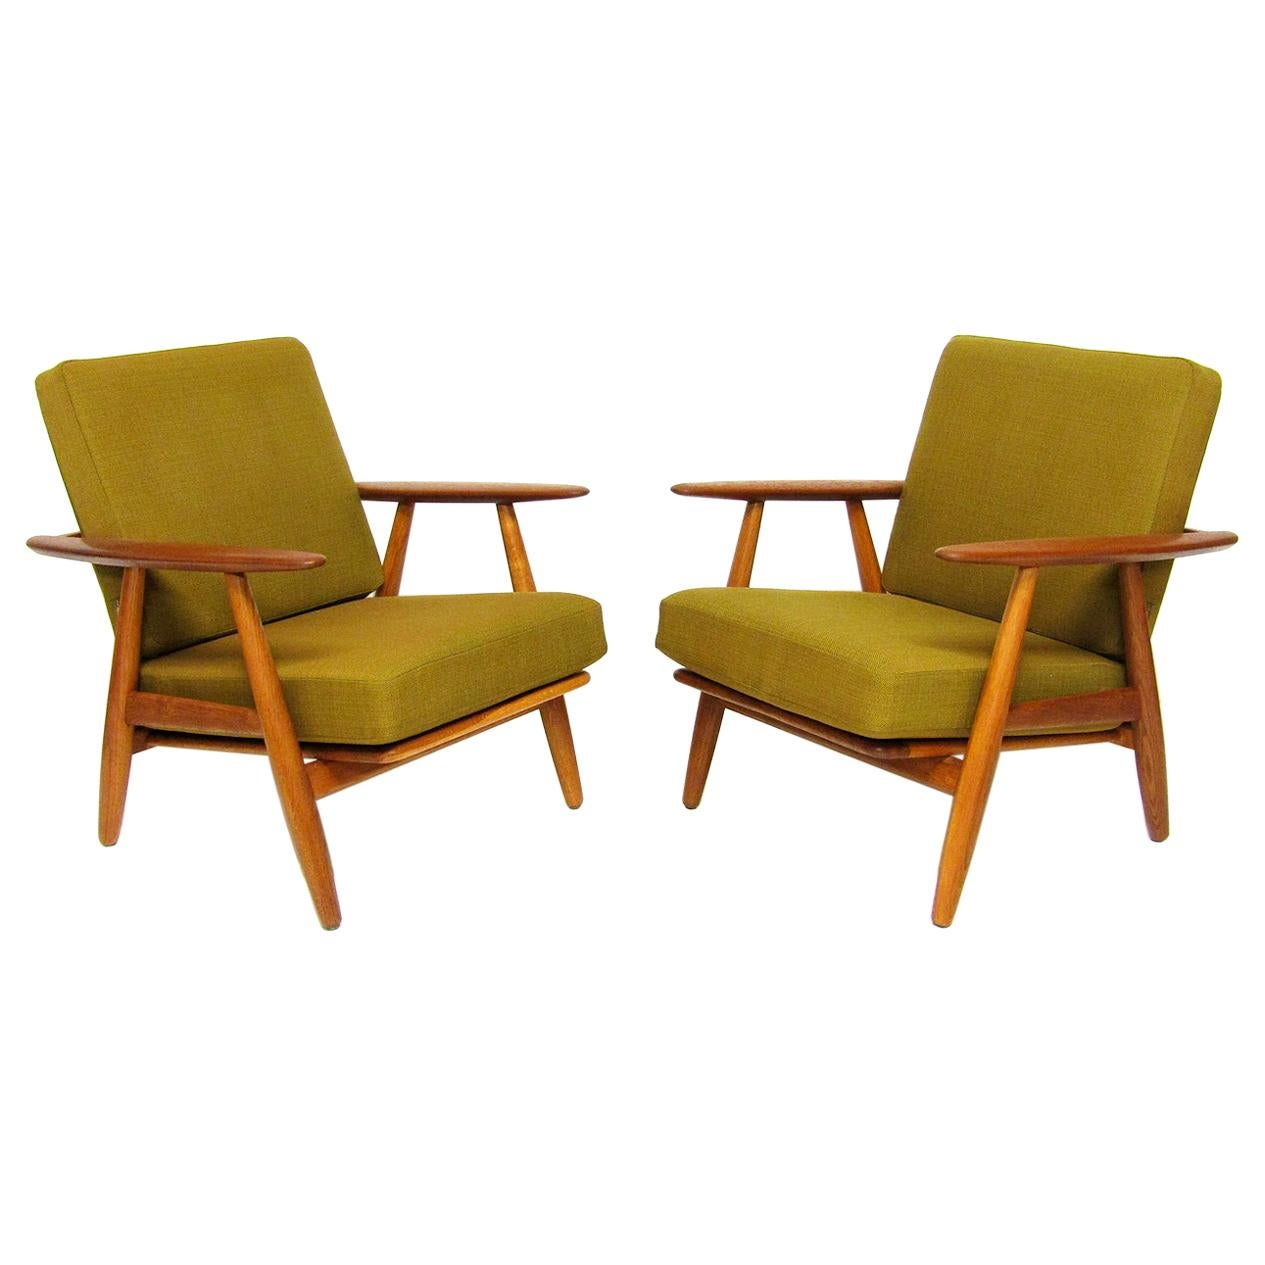 Two Danish 1960s GE-240 Cigar Chairs by Hans Wegner for GETAMA